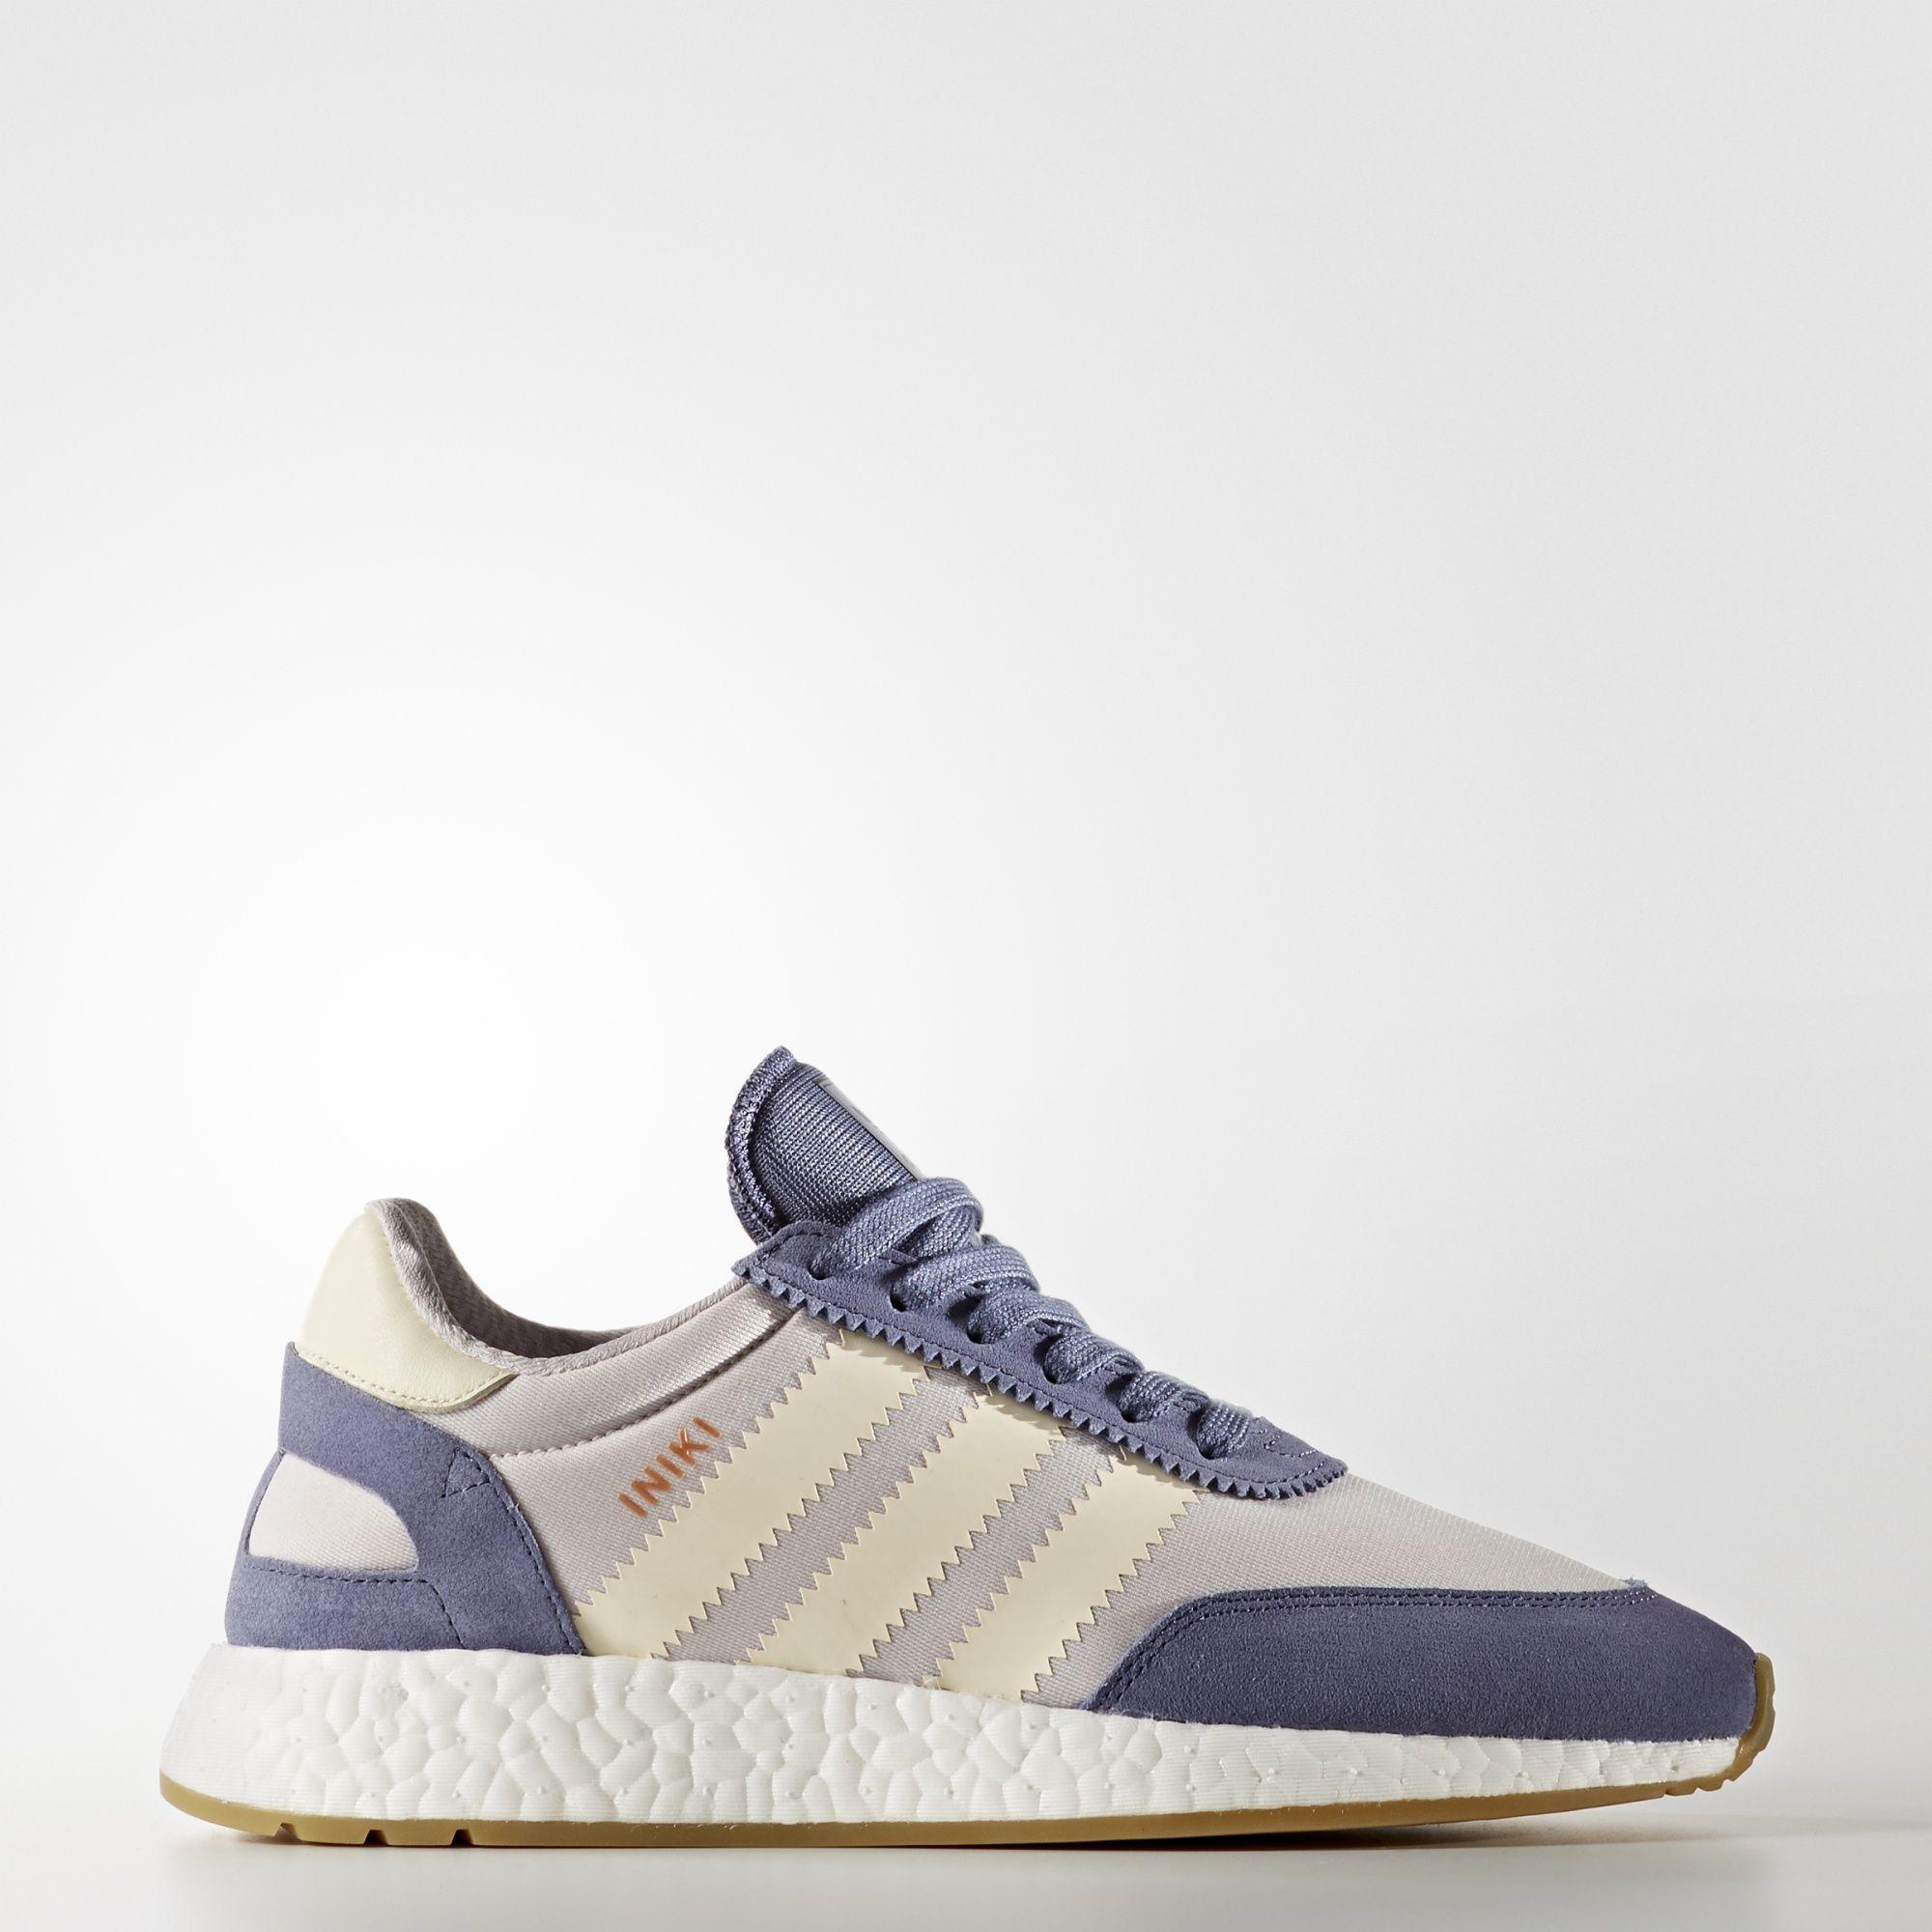 adidas - Iniki Runner Shoes